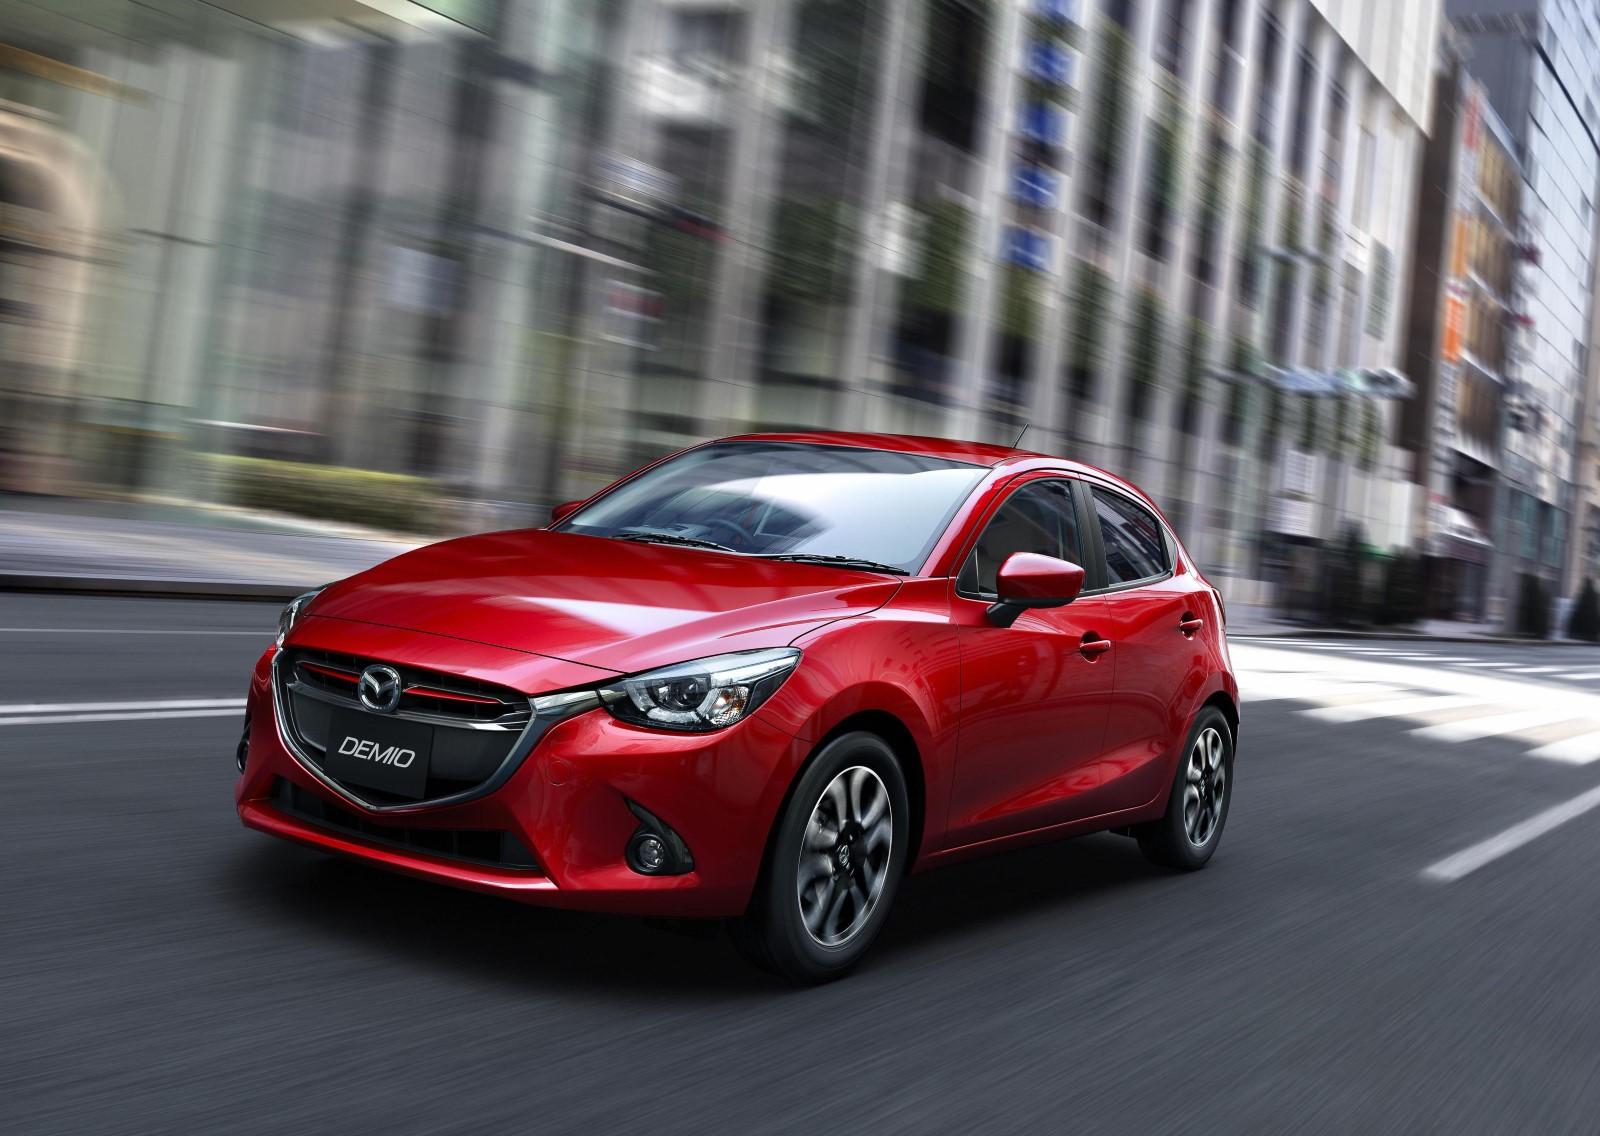 Kelebihan Mazda 2 2016 Spesifikasi